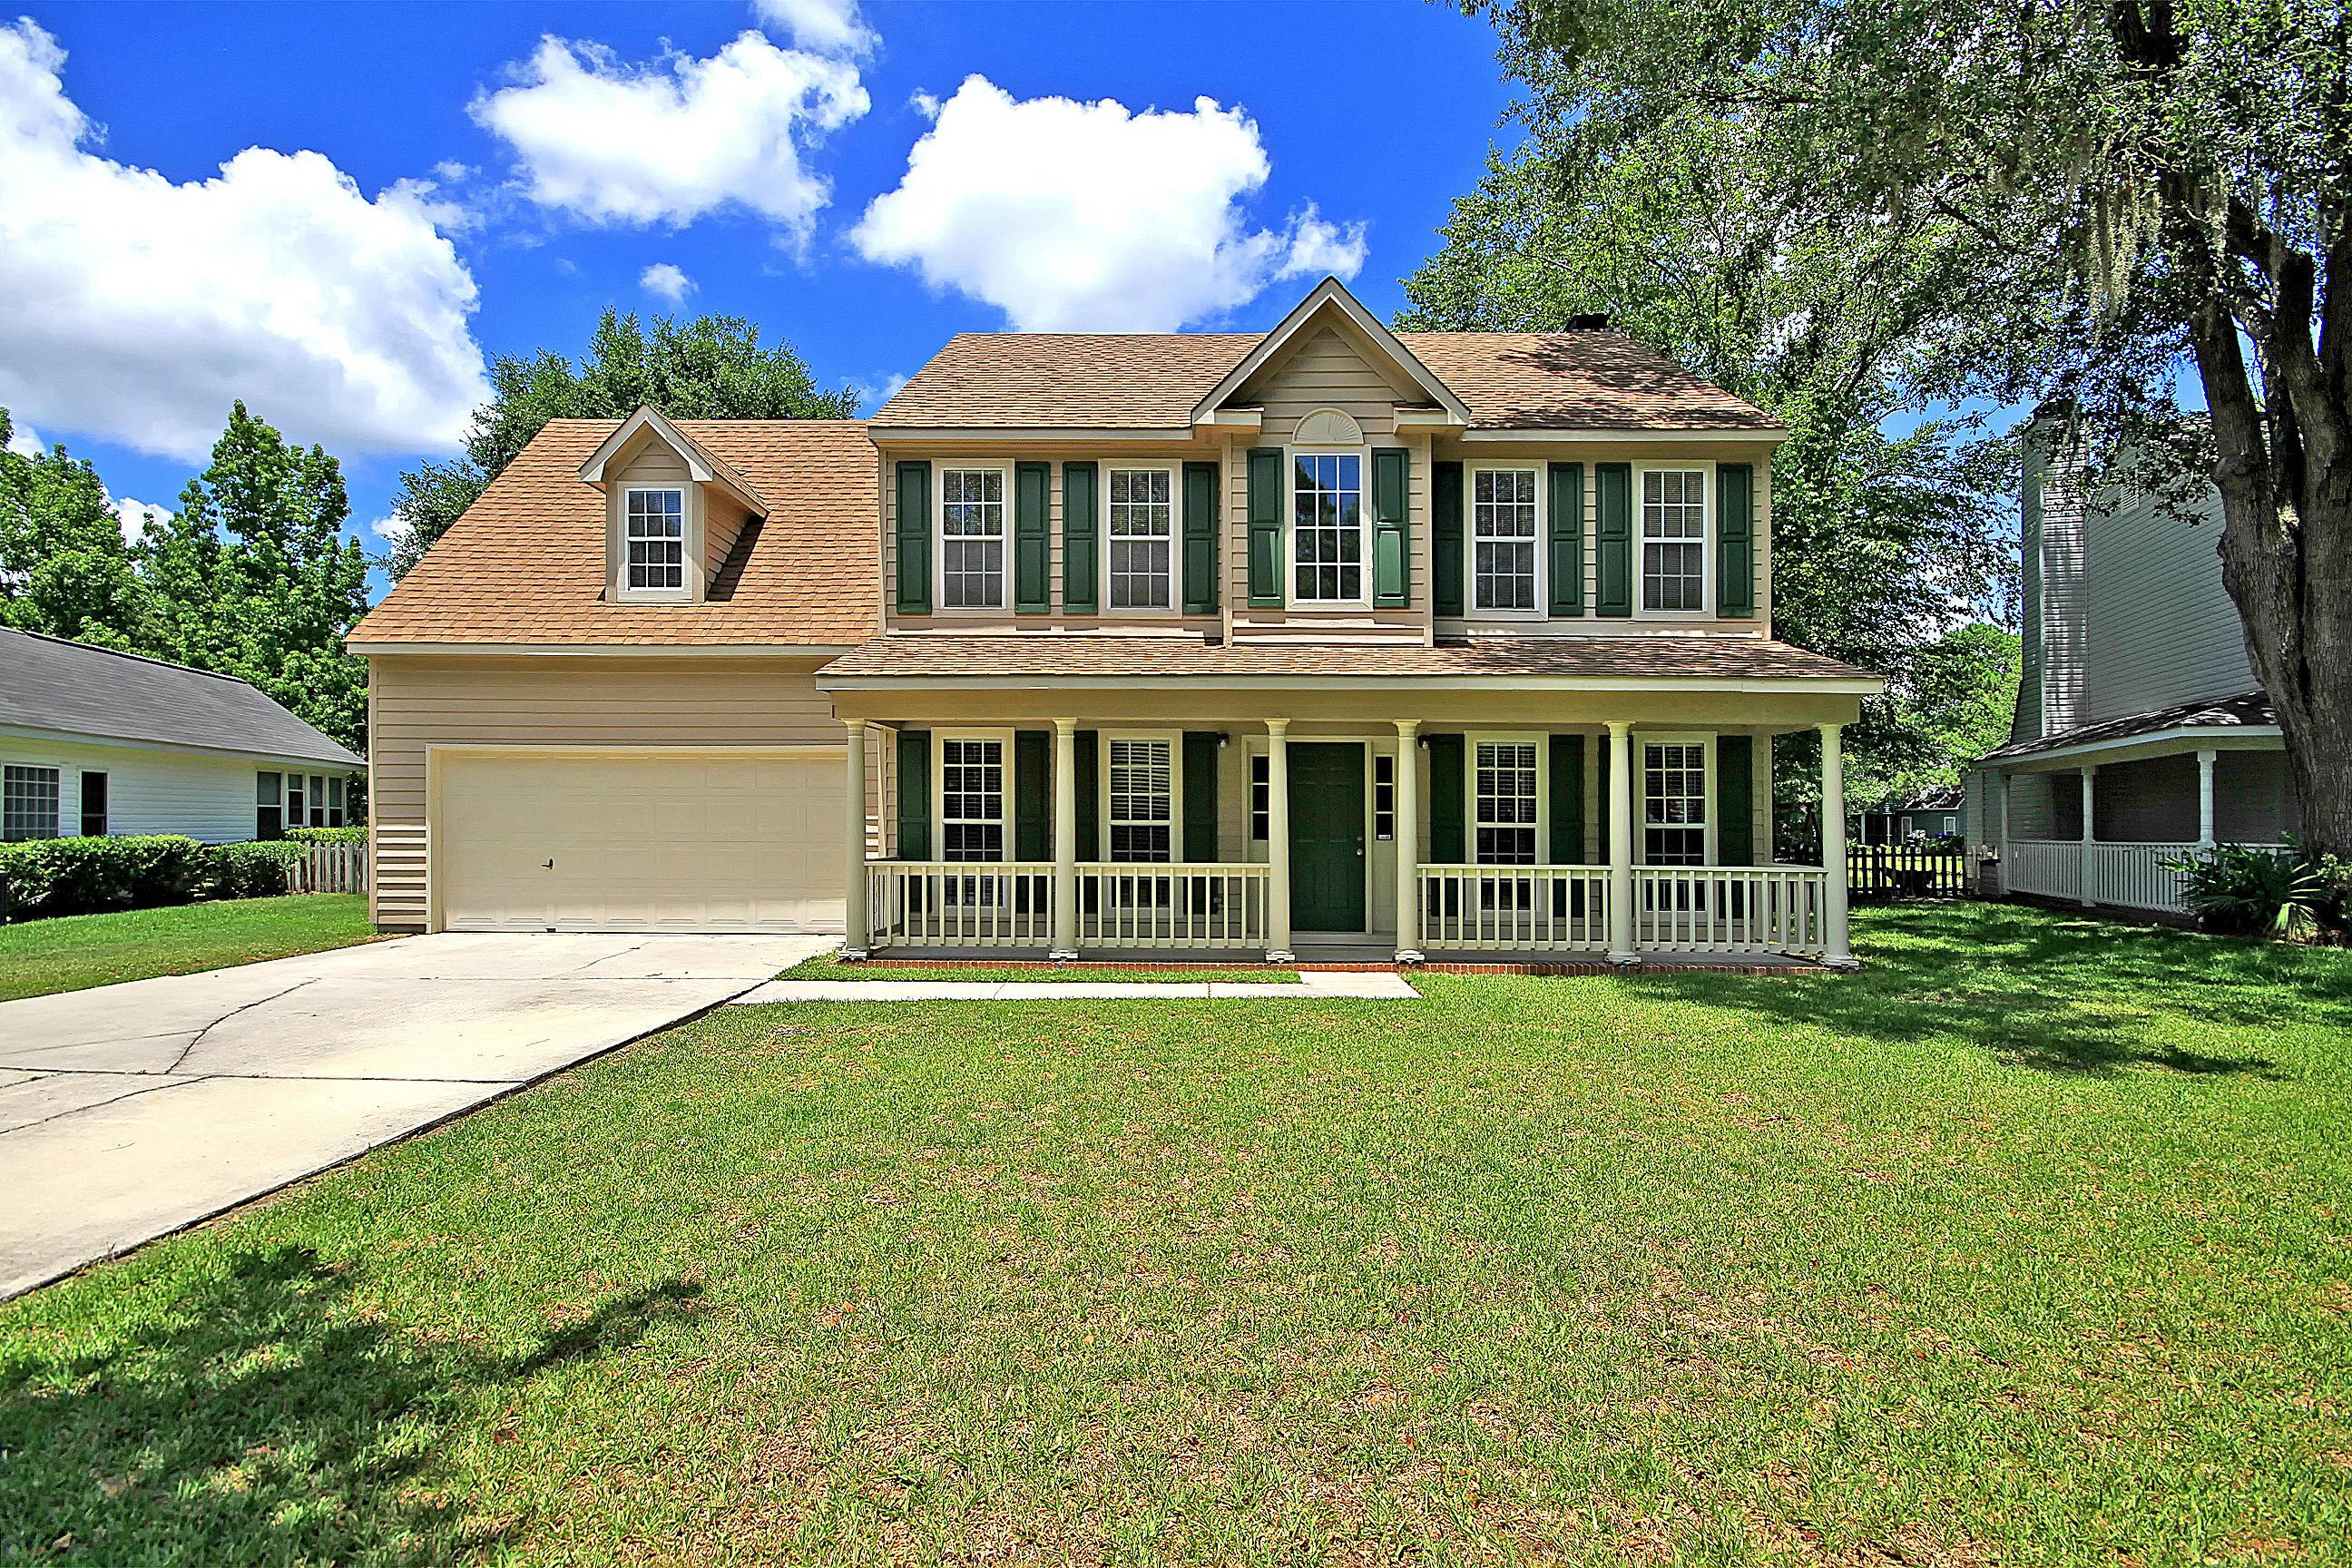 Center Lake Homes For Sale - 1252 Center Lake, Mount Pleasant, SC - 24